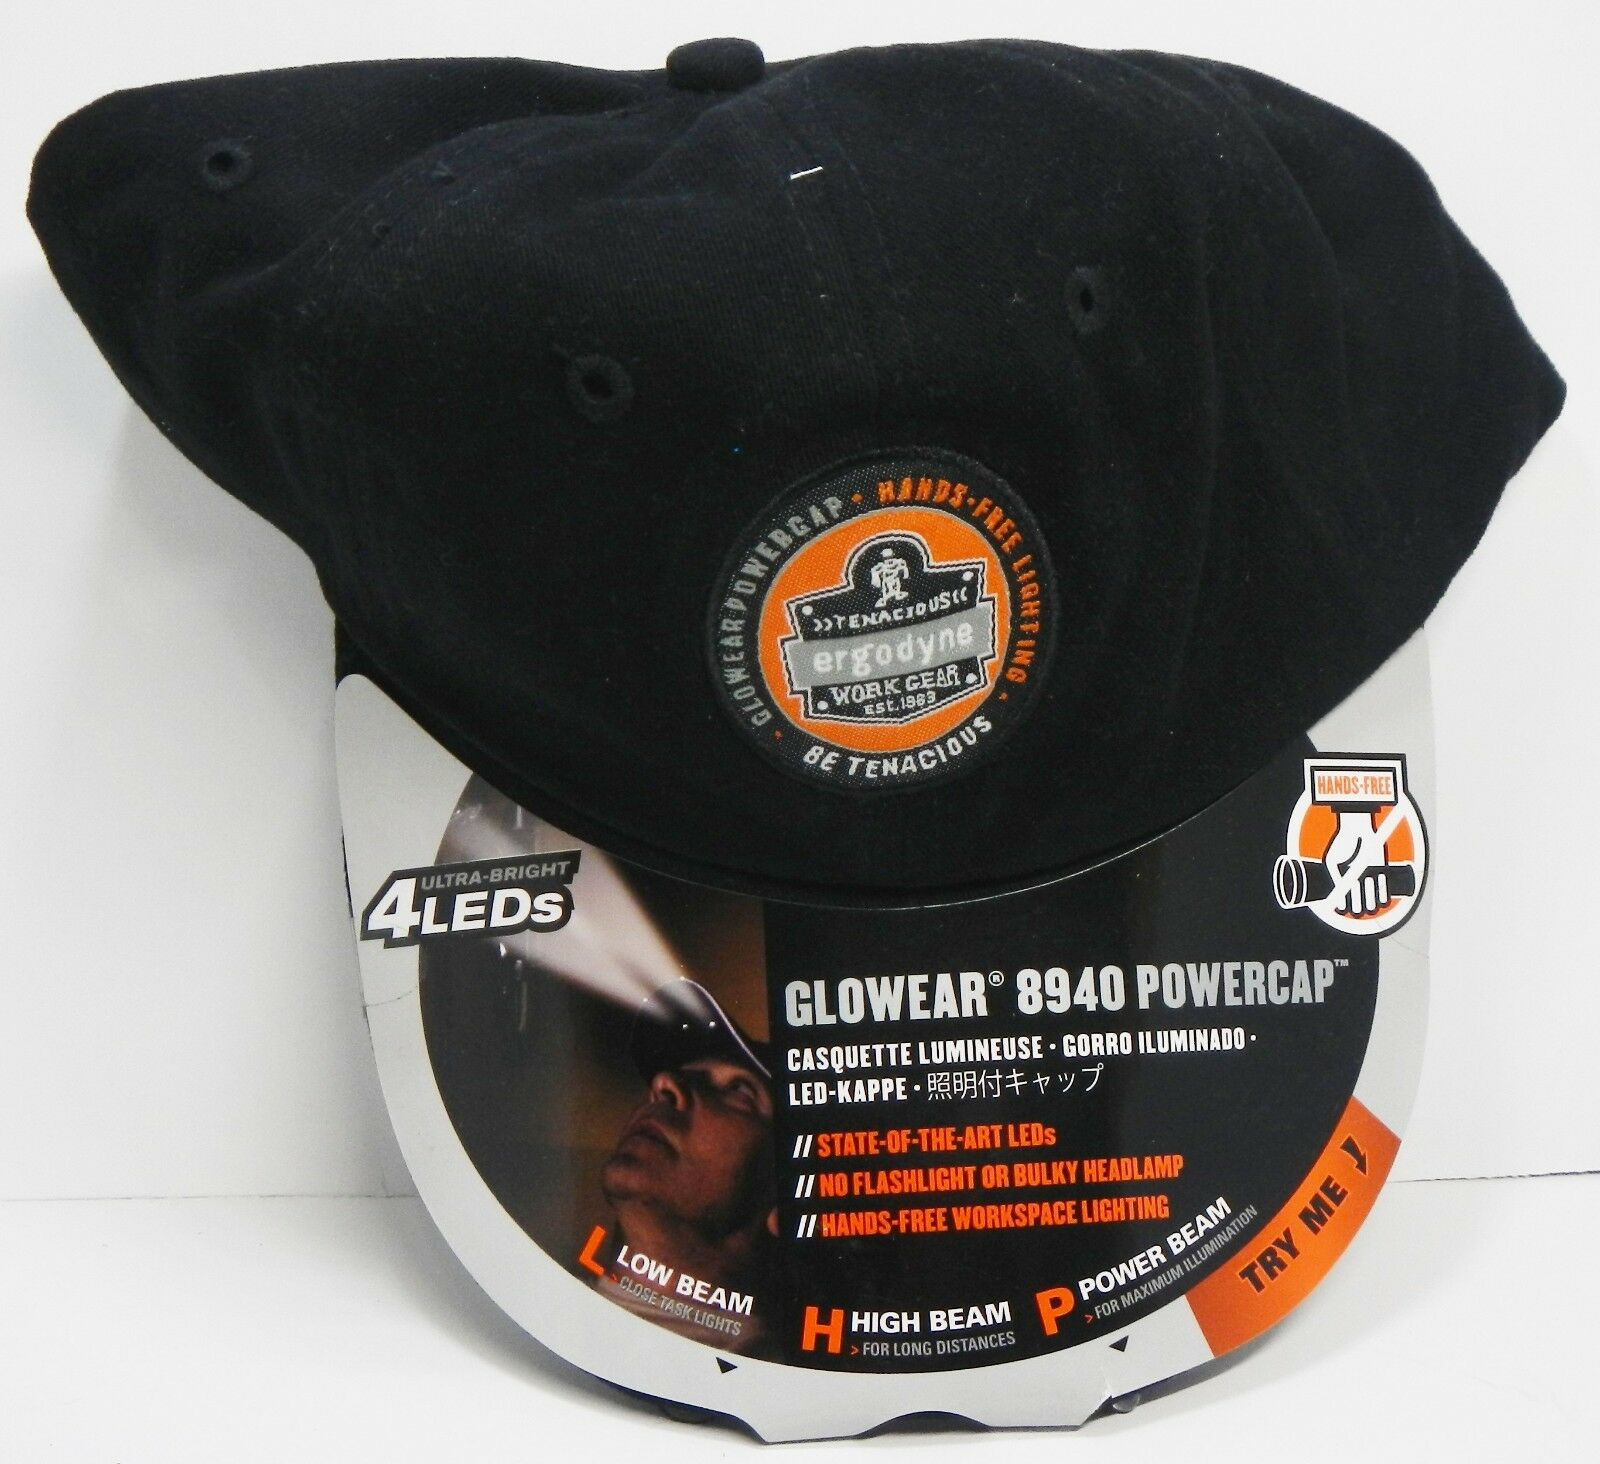 Tenacious Work Gear Ergodyne Glowear 8940 Power Cap w/ 4 Ult